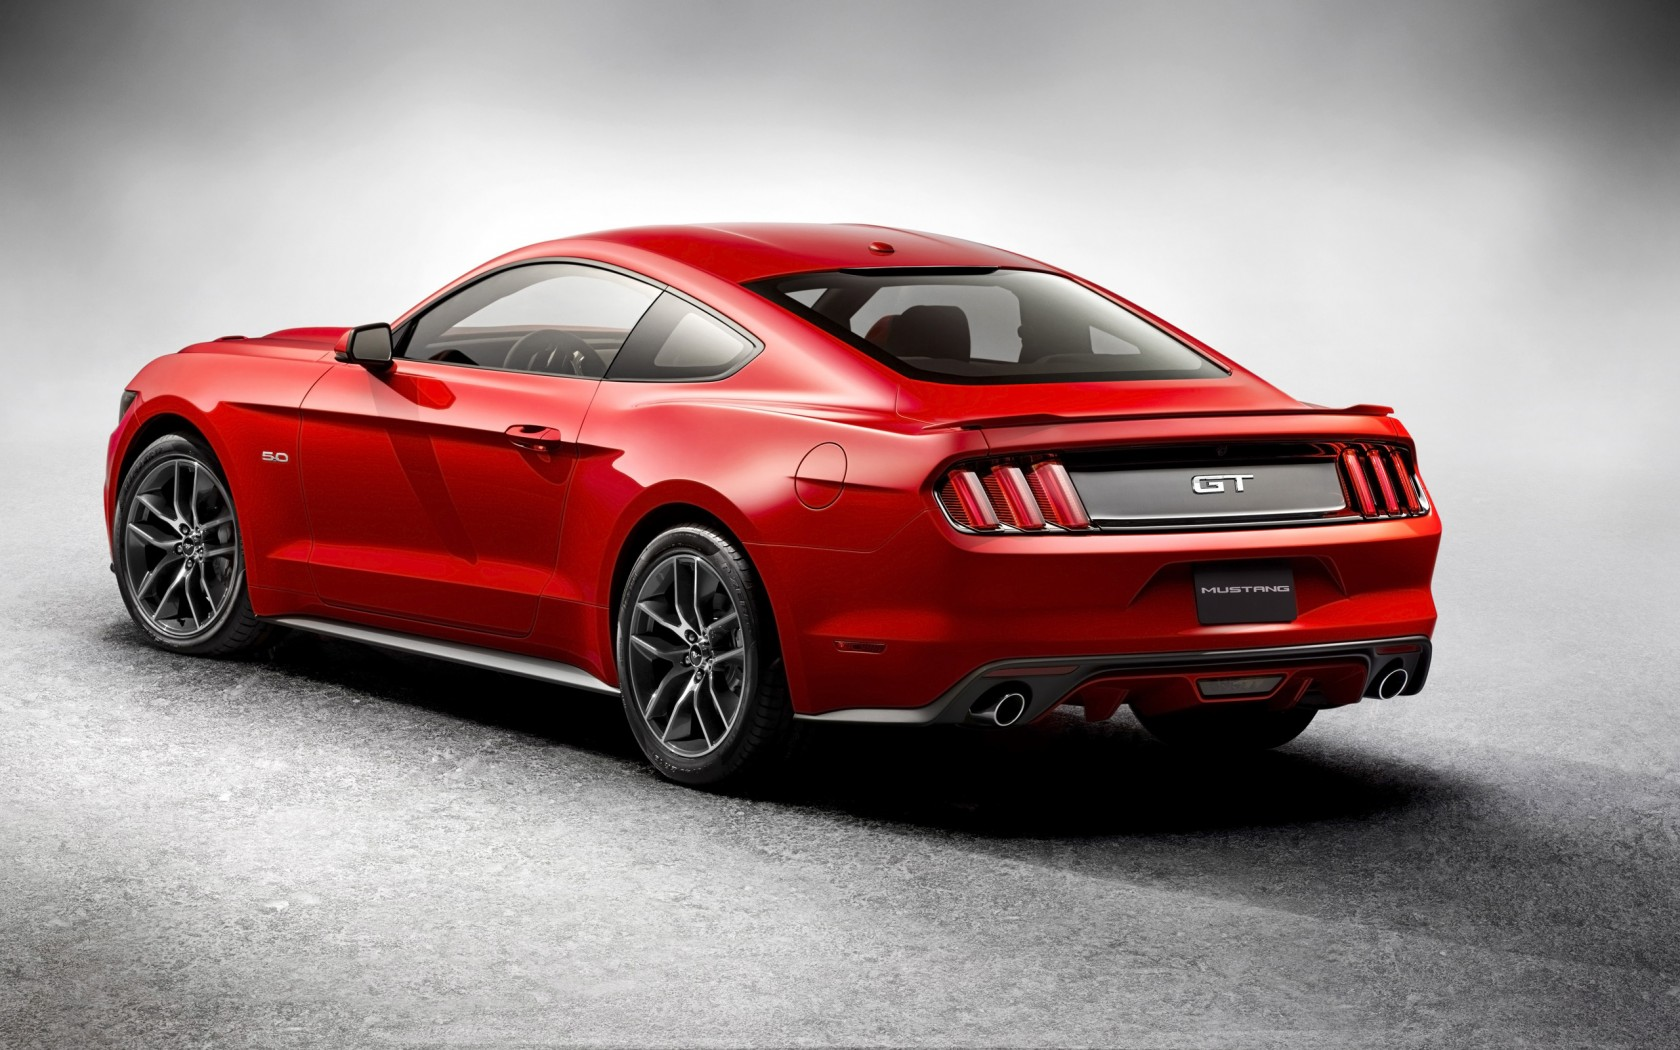 2015 Ford Mustang 3 Wallpaper Hd Car Wallpapers Id 3948